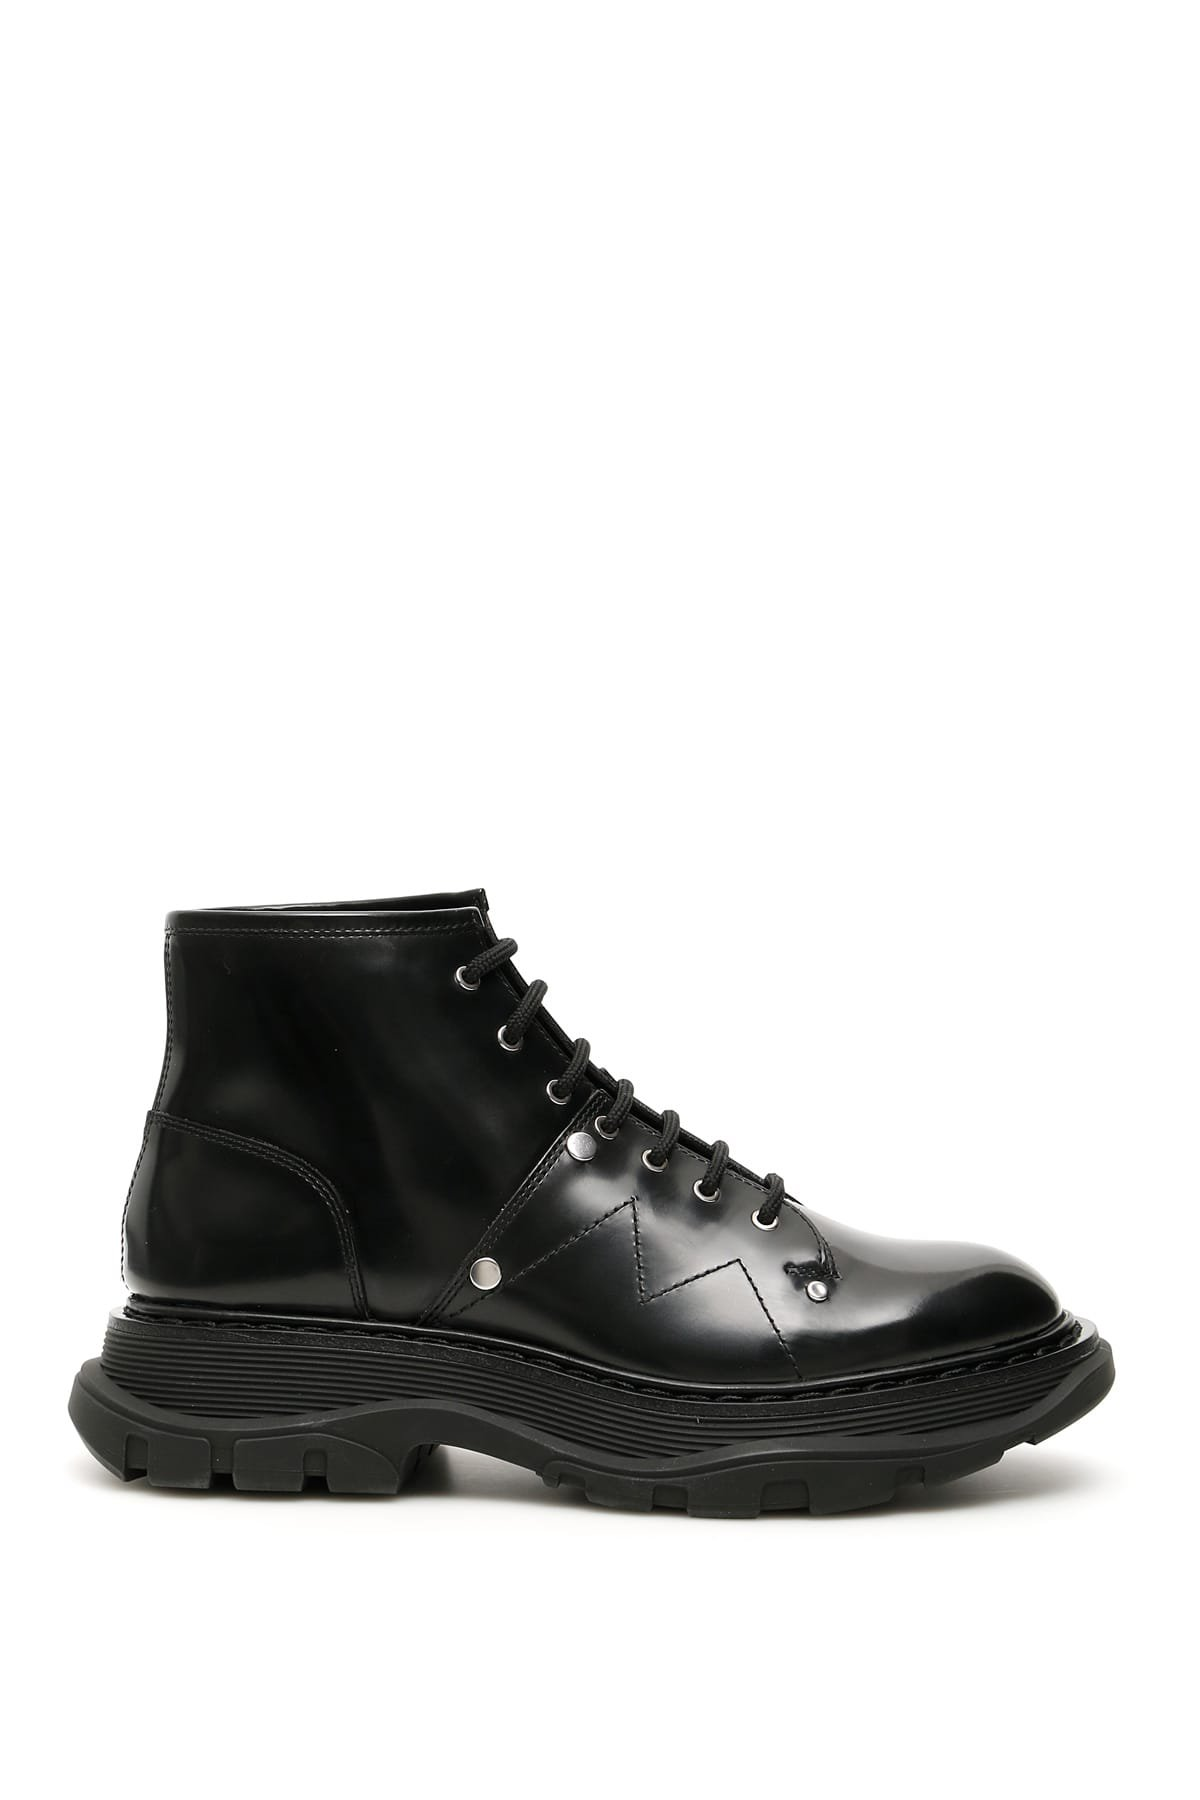 Alexander McQueen Boots With Seams